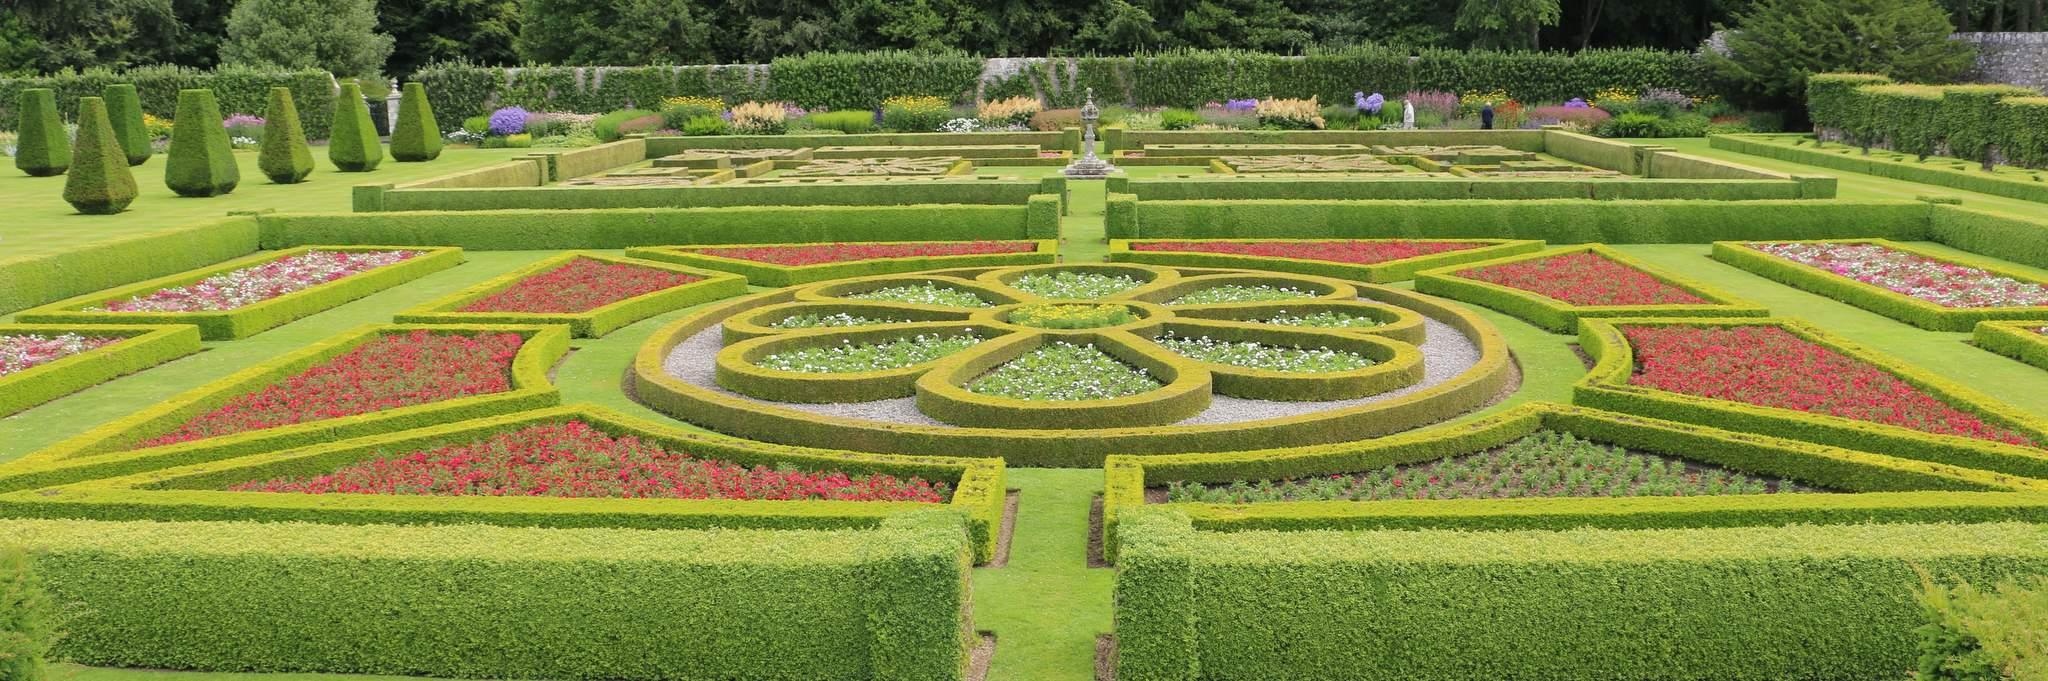 Gardens in Aberdeen, Grampian and Moray